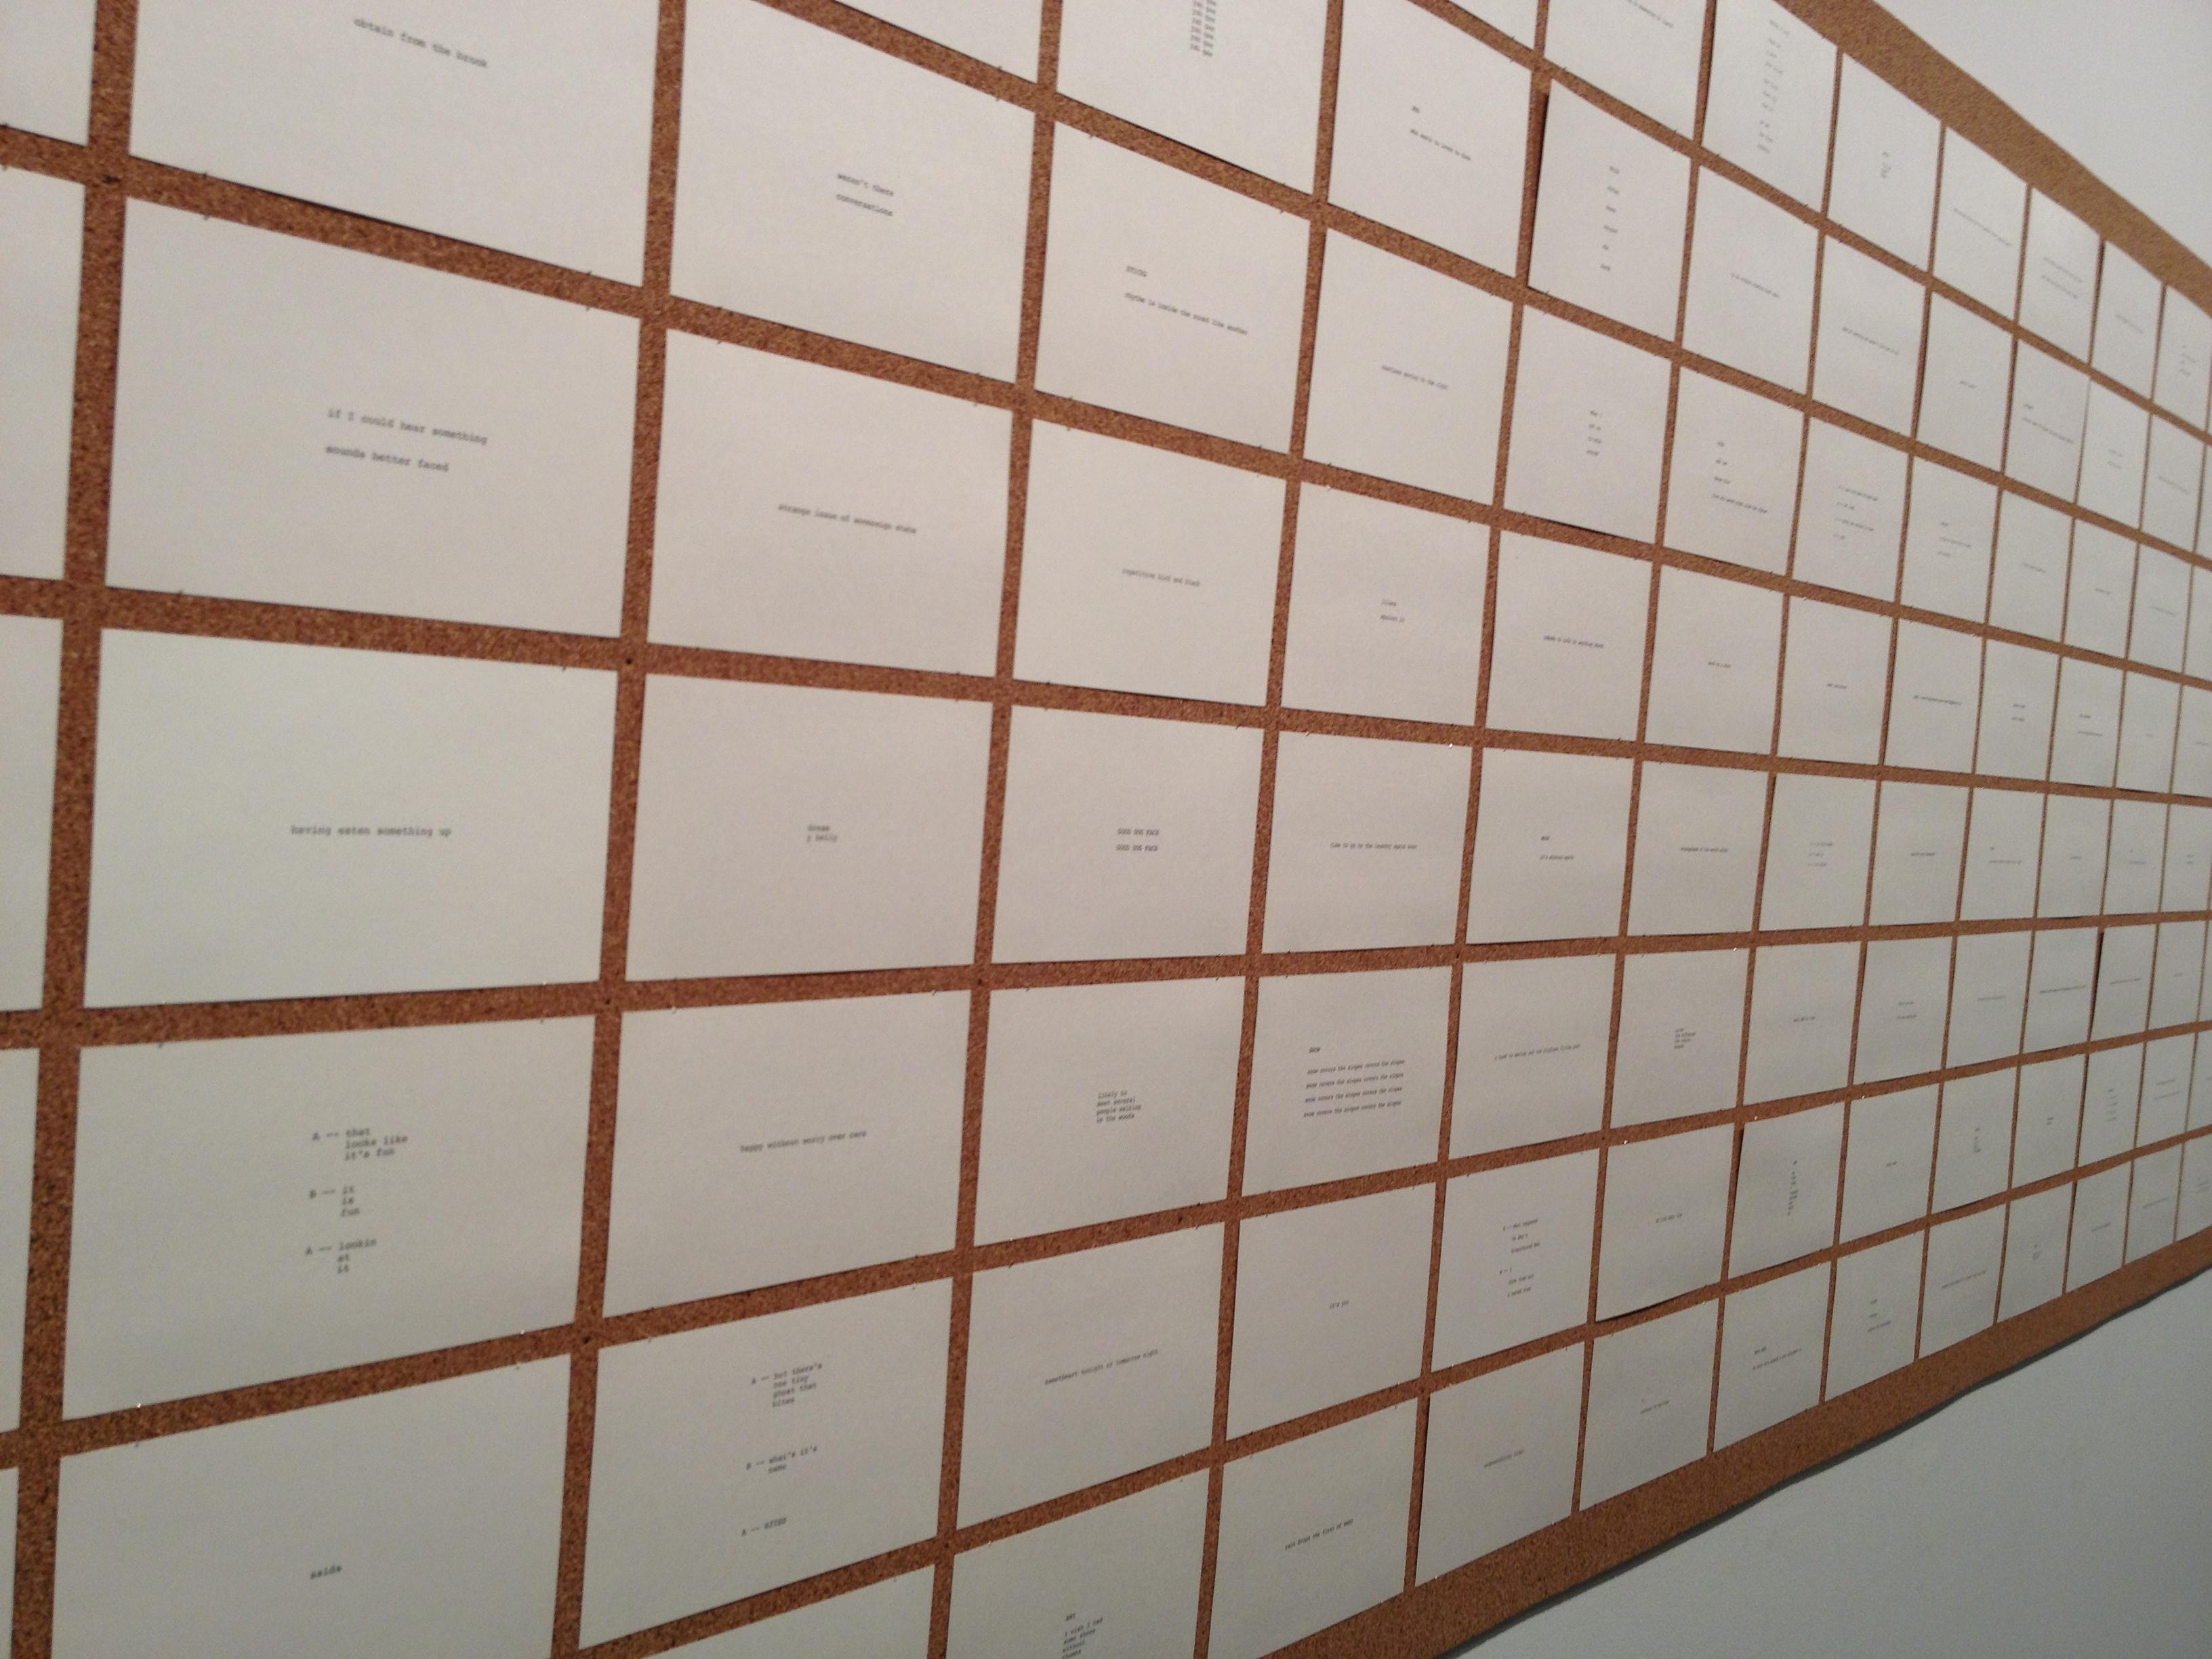 Robert Grenier's wall of poetic building blocks